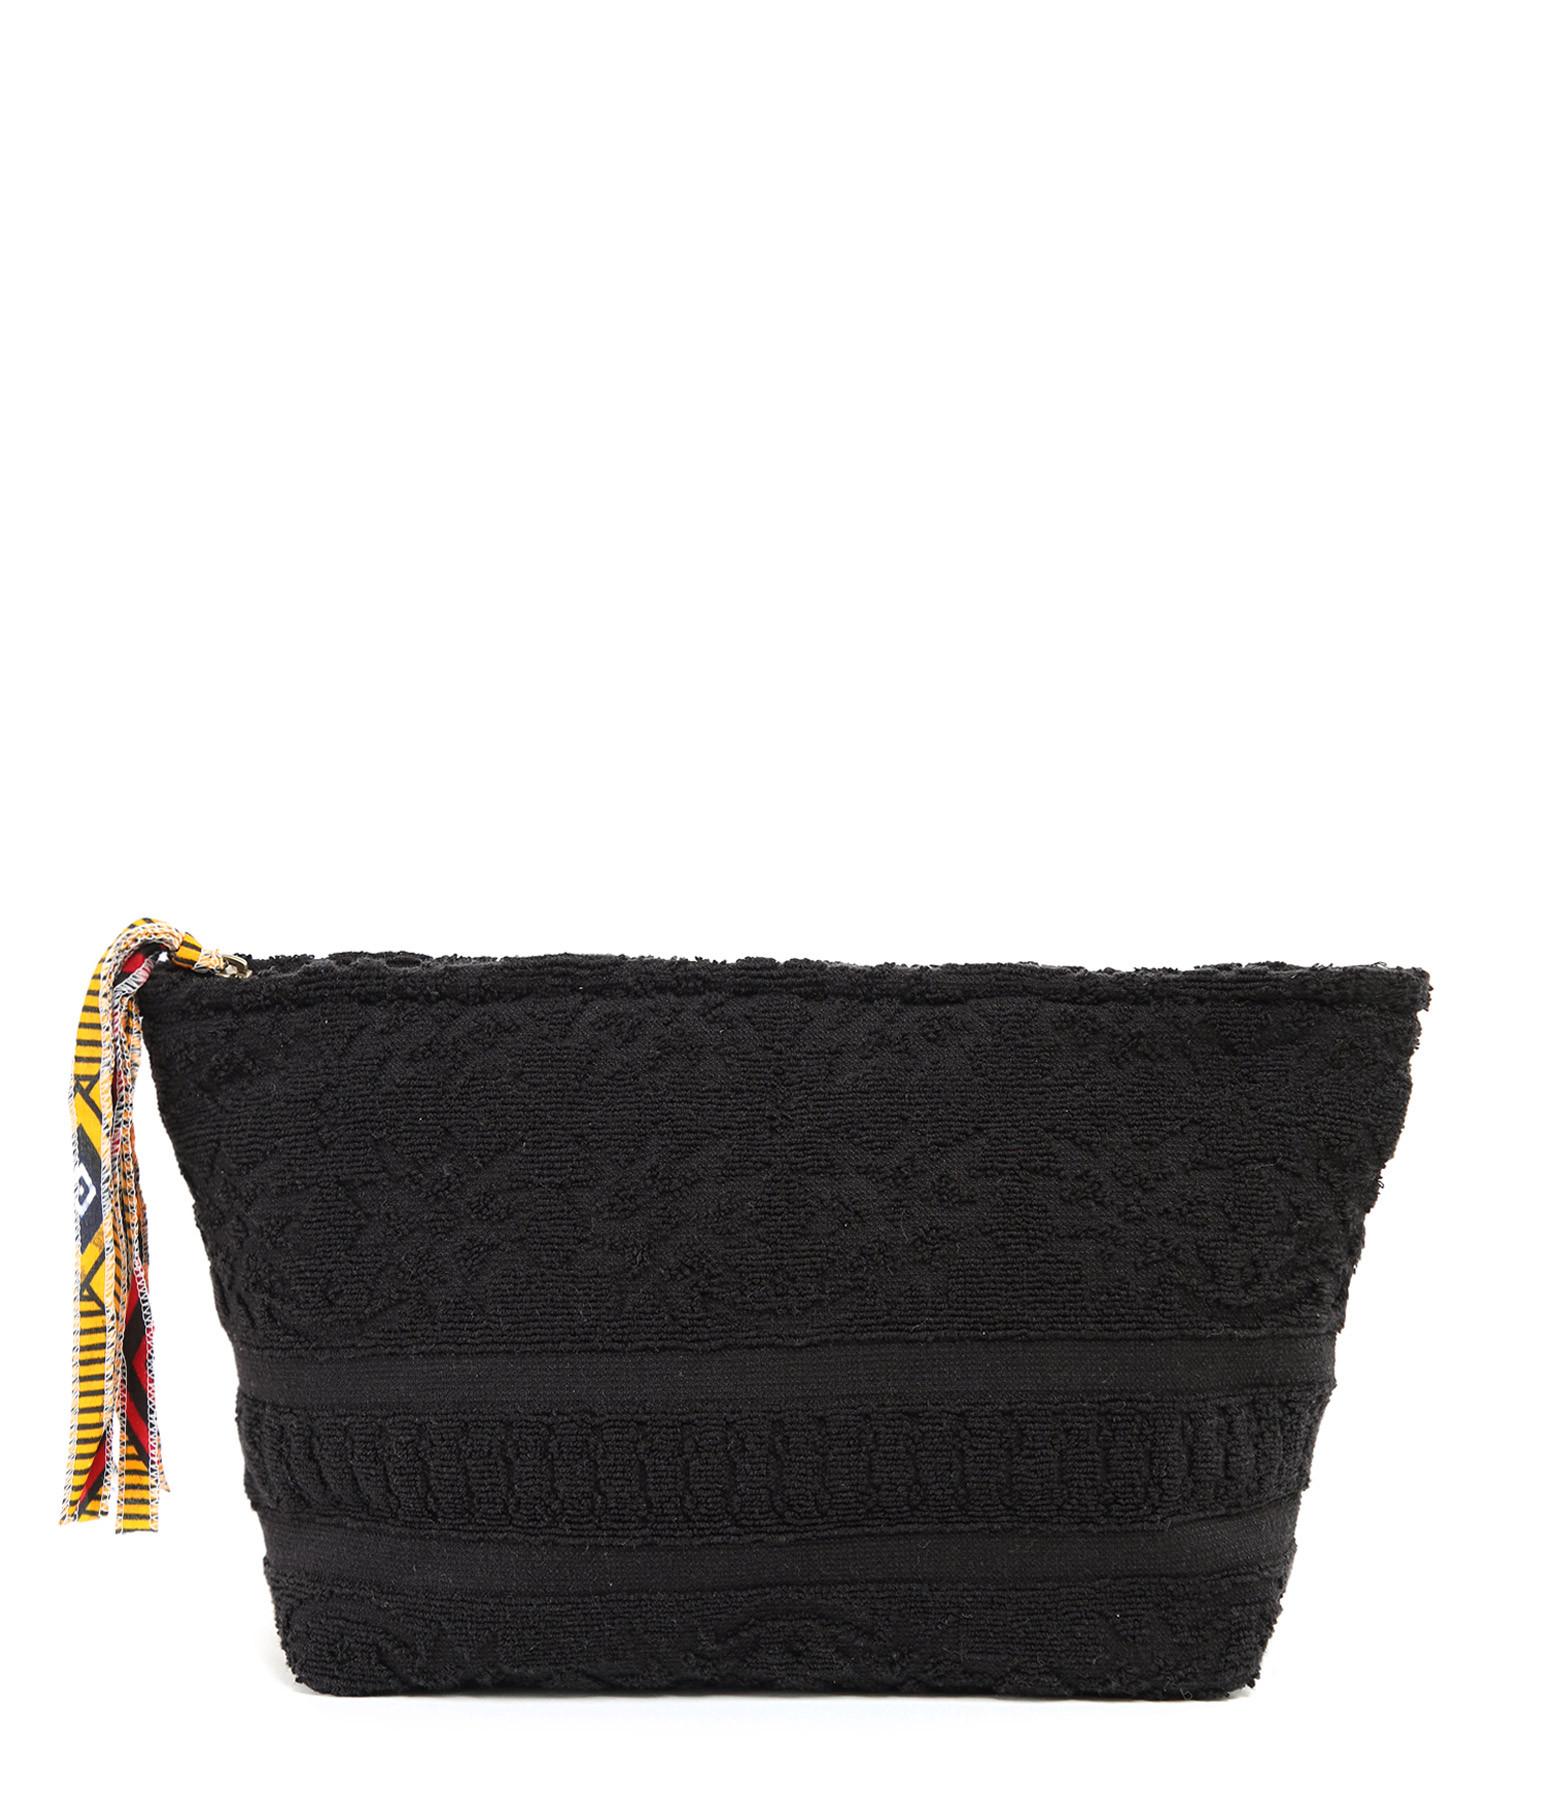 LALLA - Grande Trousse Walakin Éponge Noir